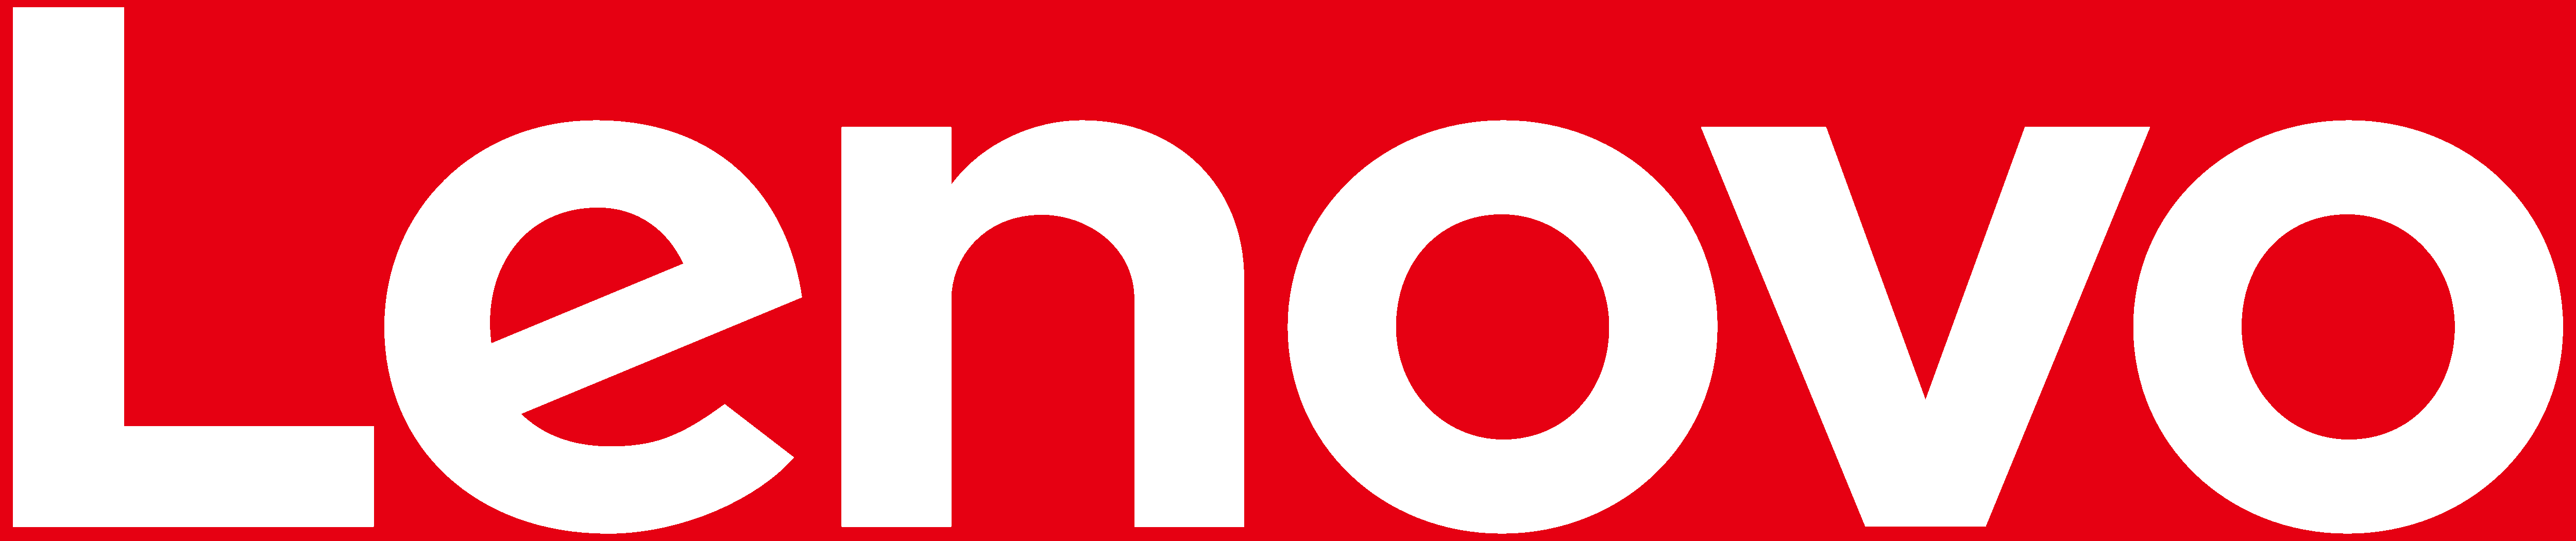 lenovo red logo png #1149